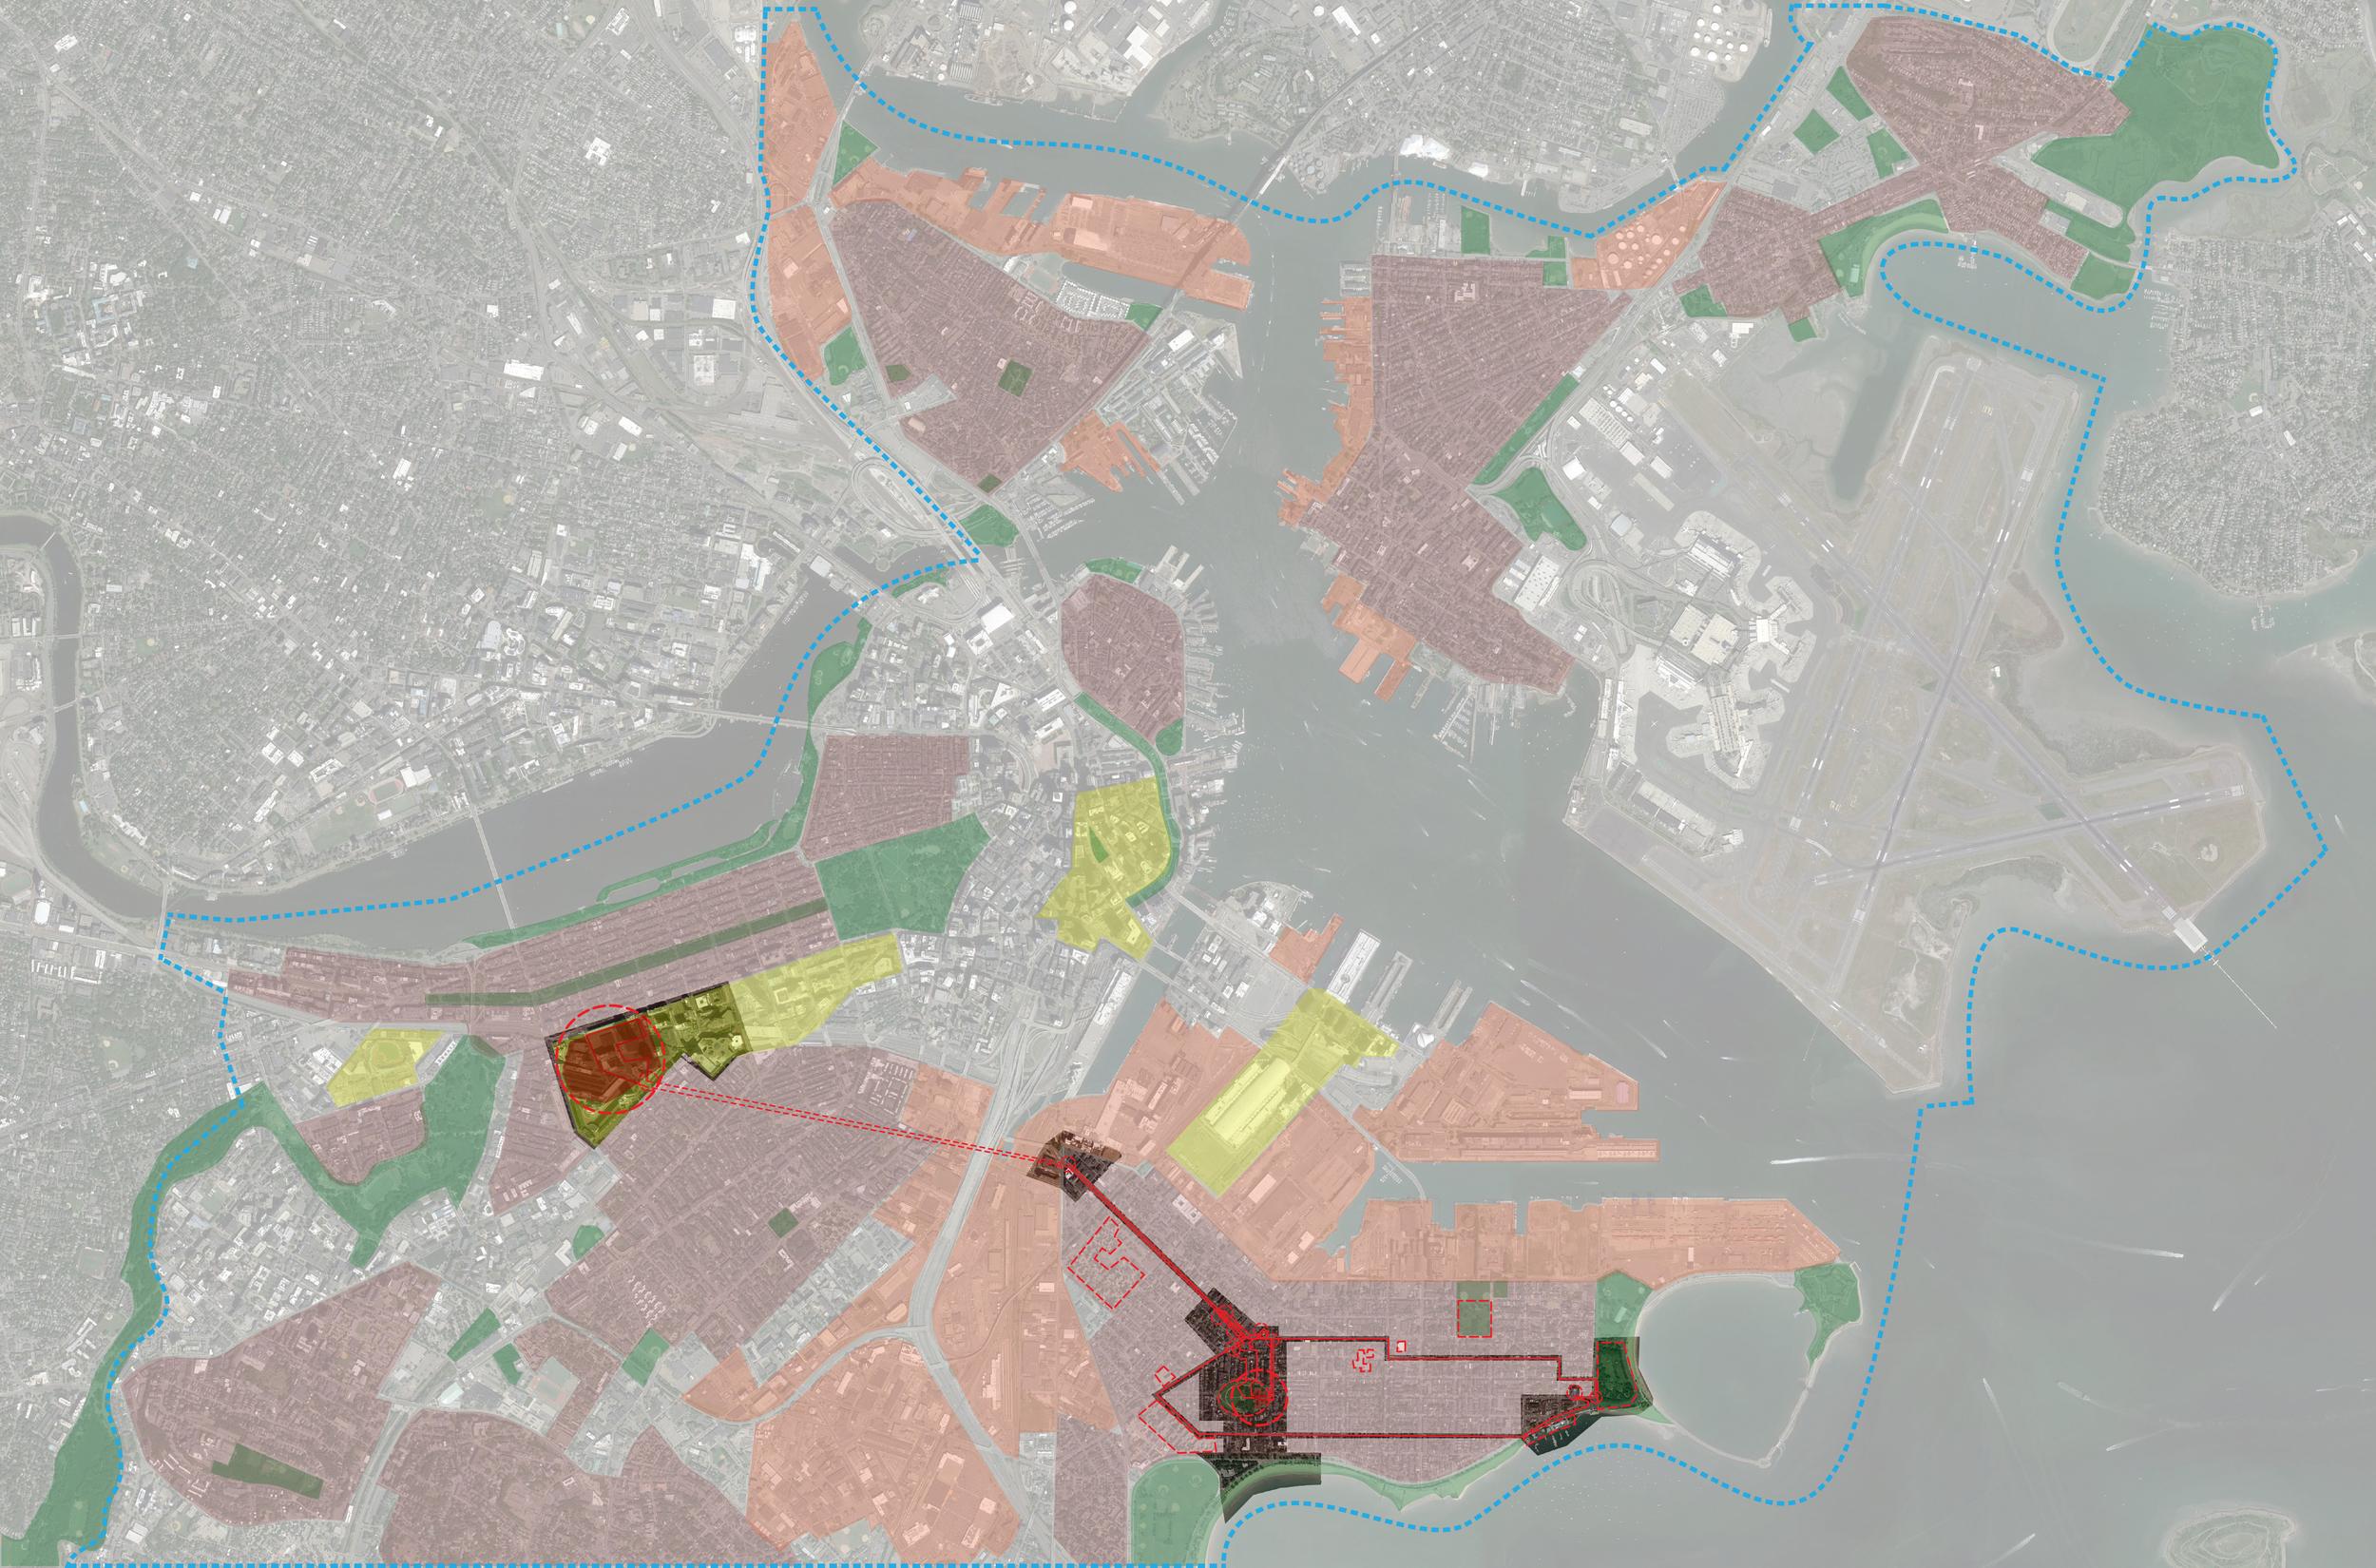 Teenager (residential) narrative on hyper-world map of Boston